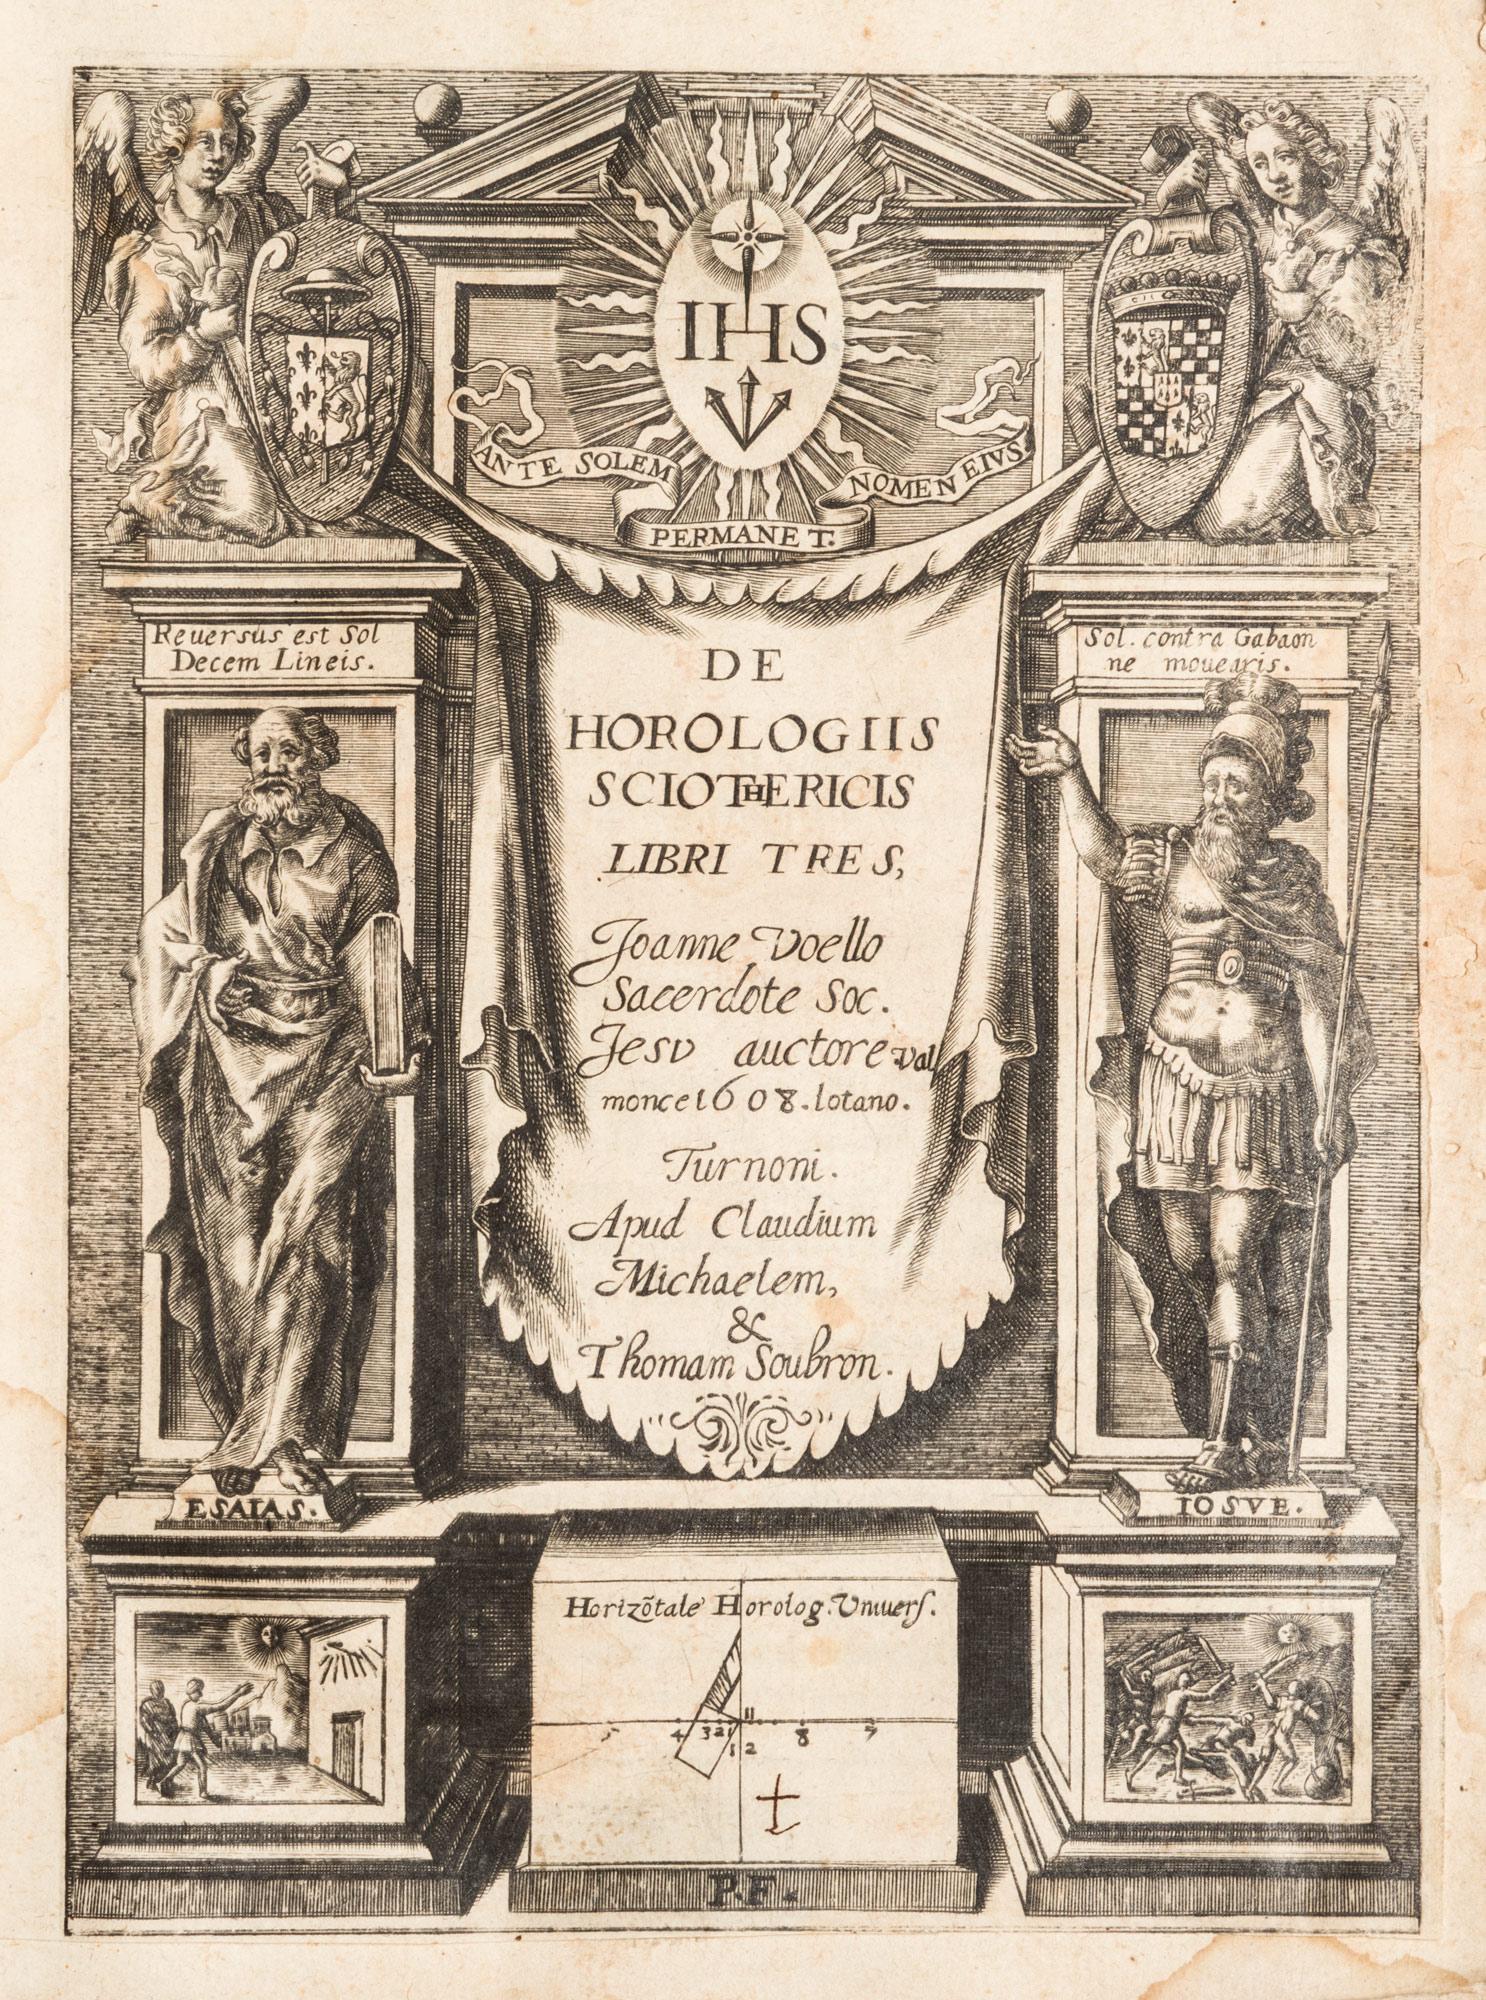 De Horologiis sciothericis libri tres.